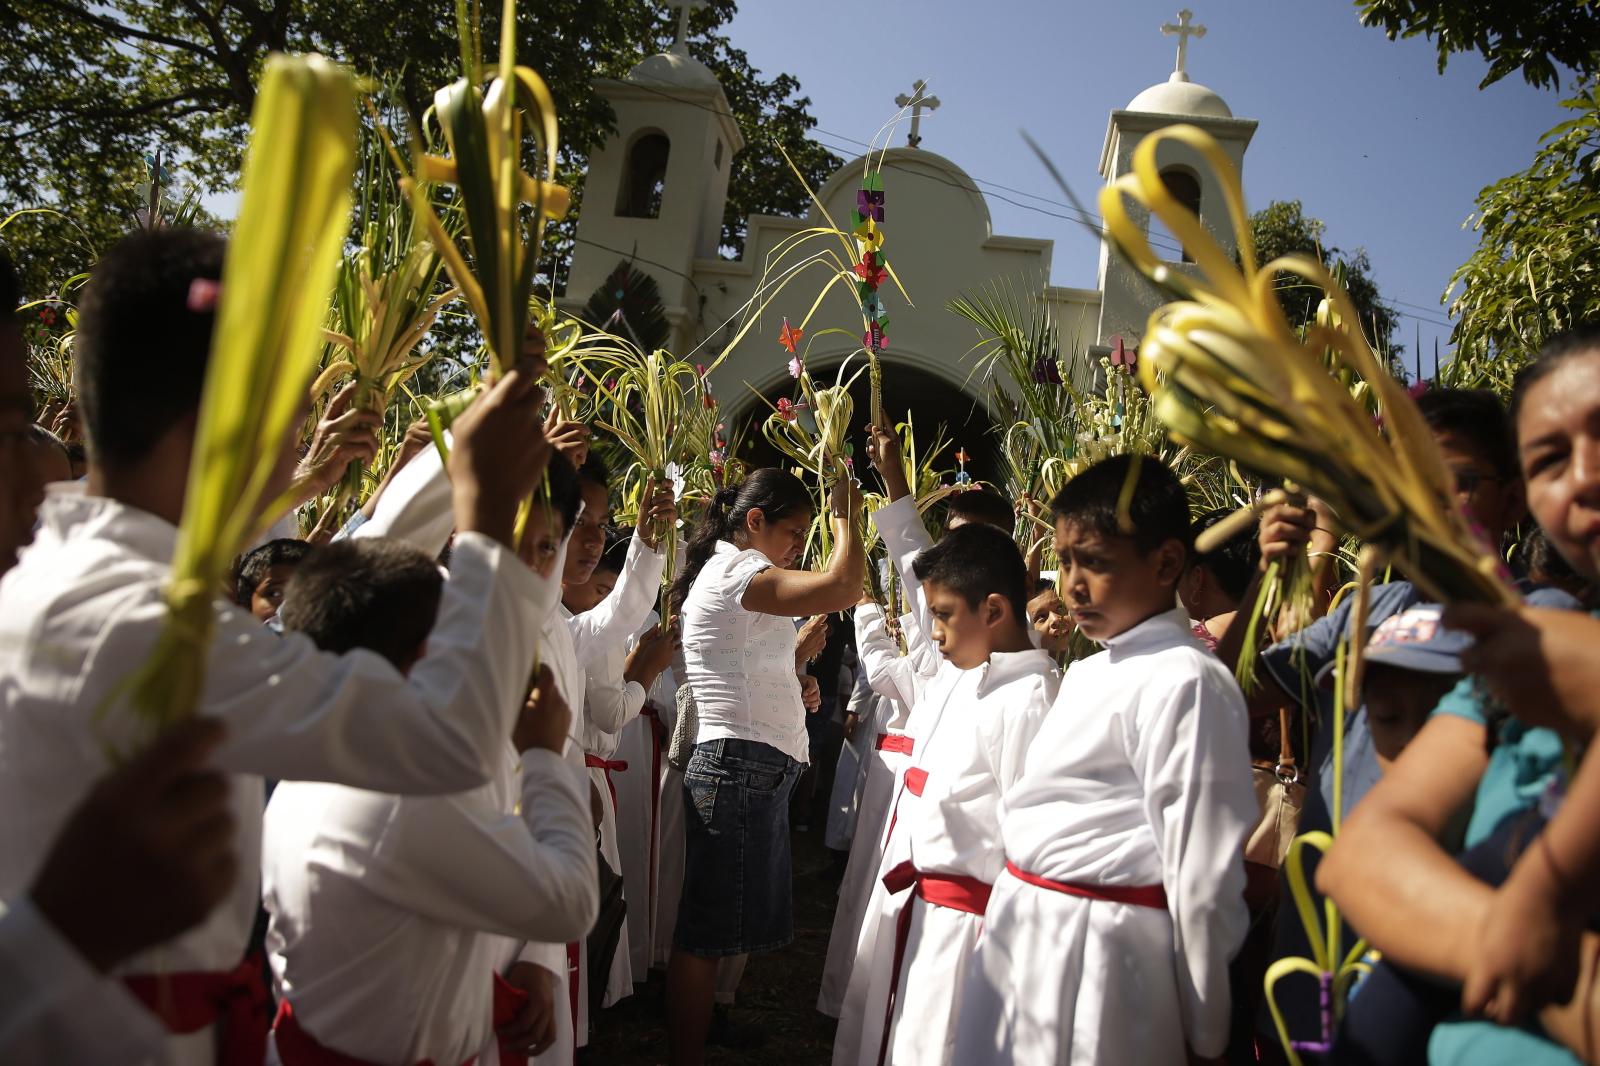 Niedziela Palmowa w El Salvador/PAP/EPA/Rodrigo Sura